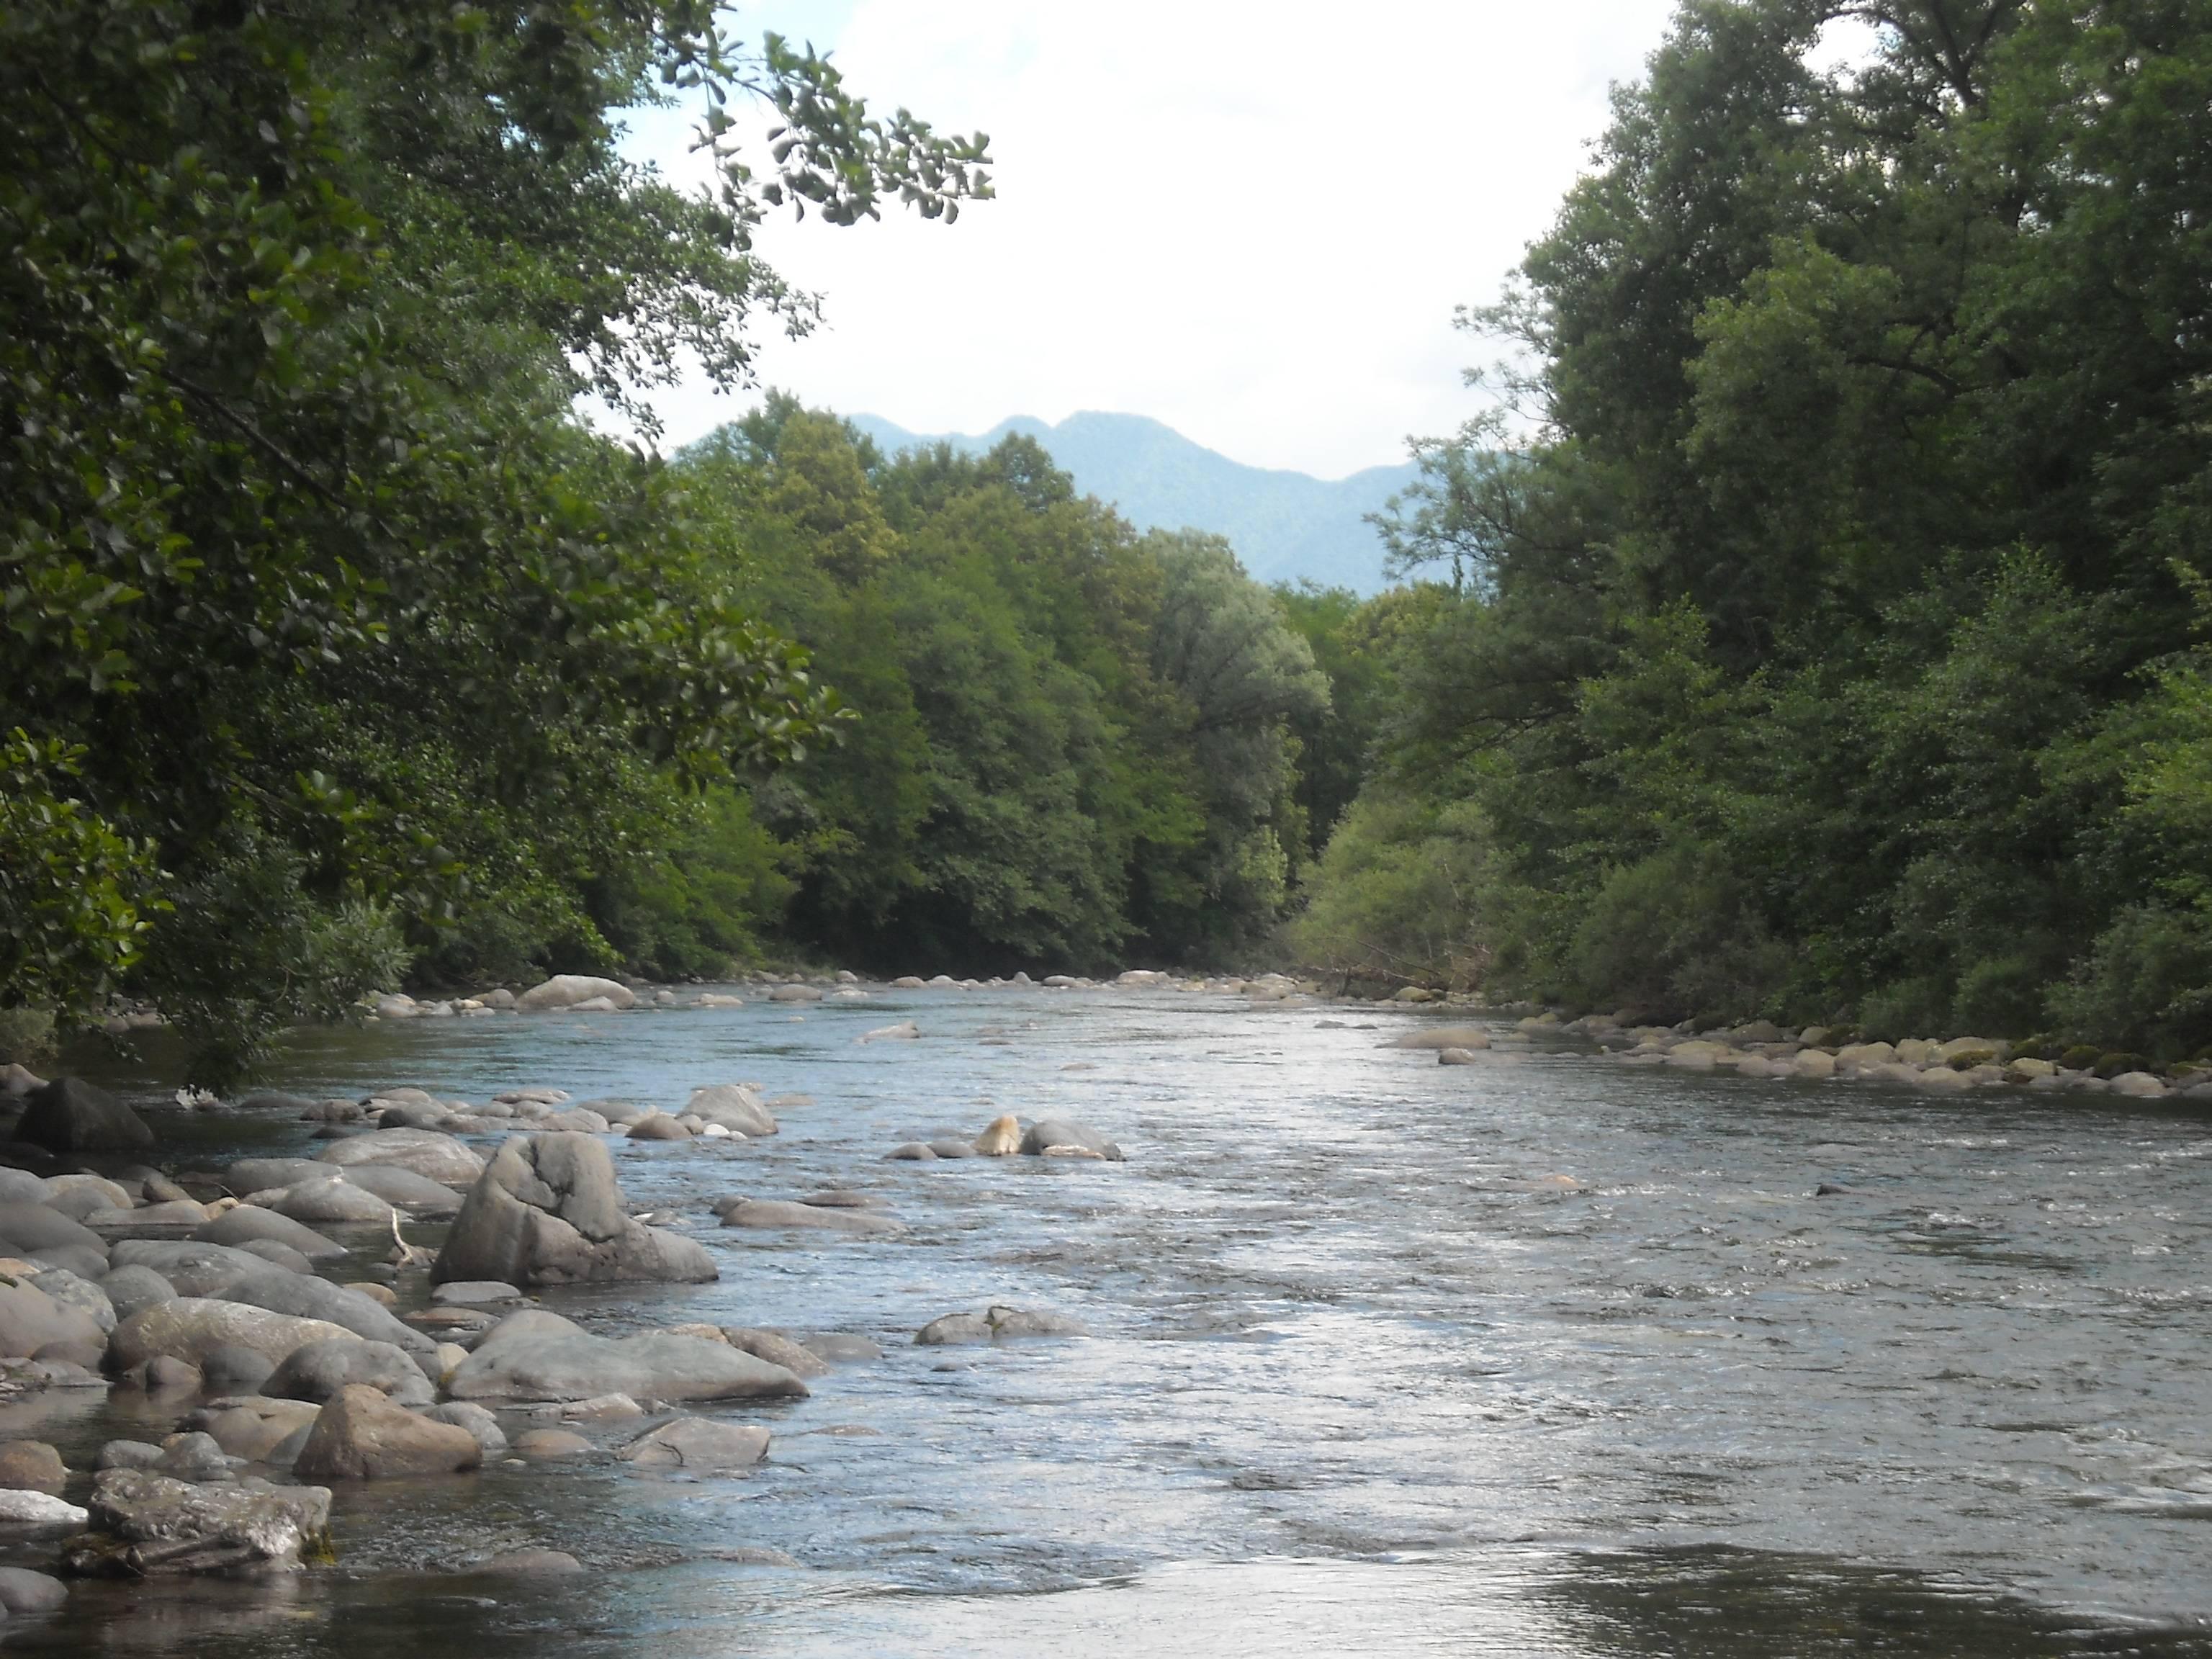 fiume San Bernardino/San Bernardino river